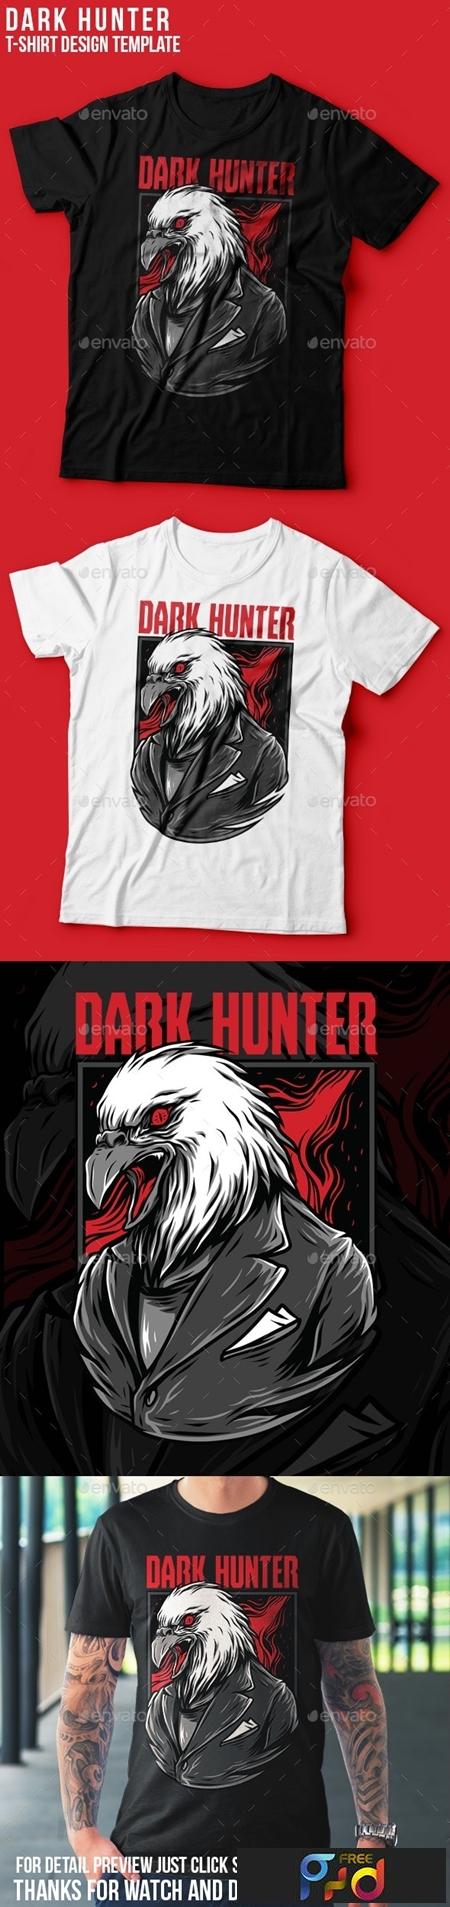 Dark Hunter T-Shirt Design 23843101 1